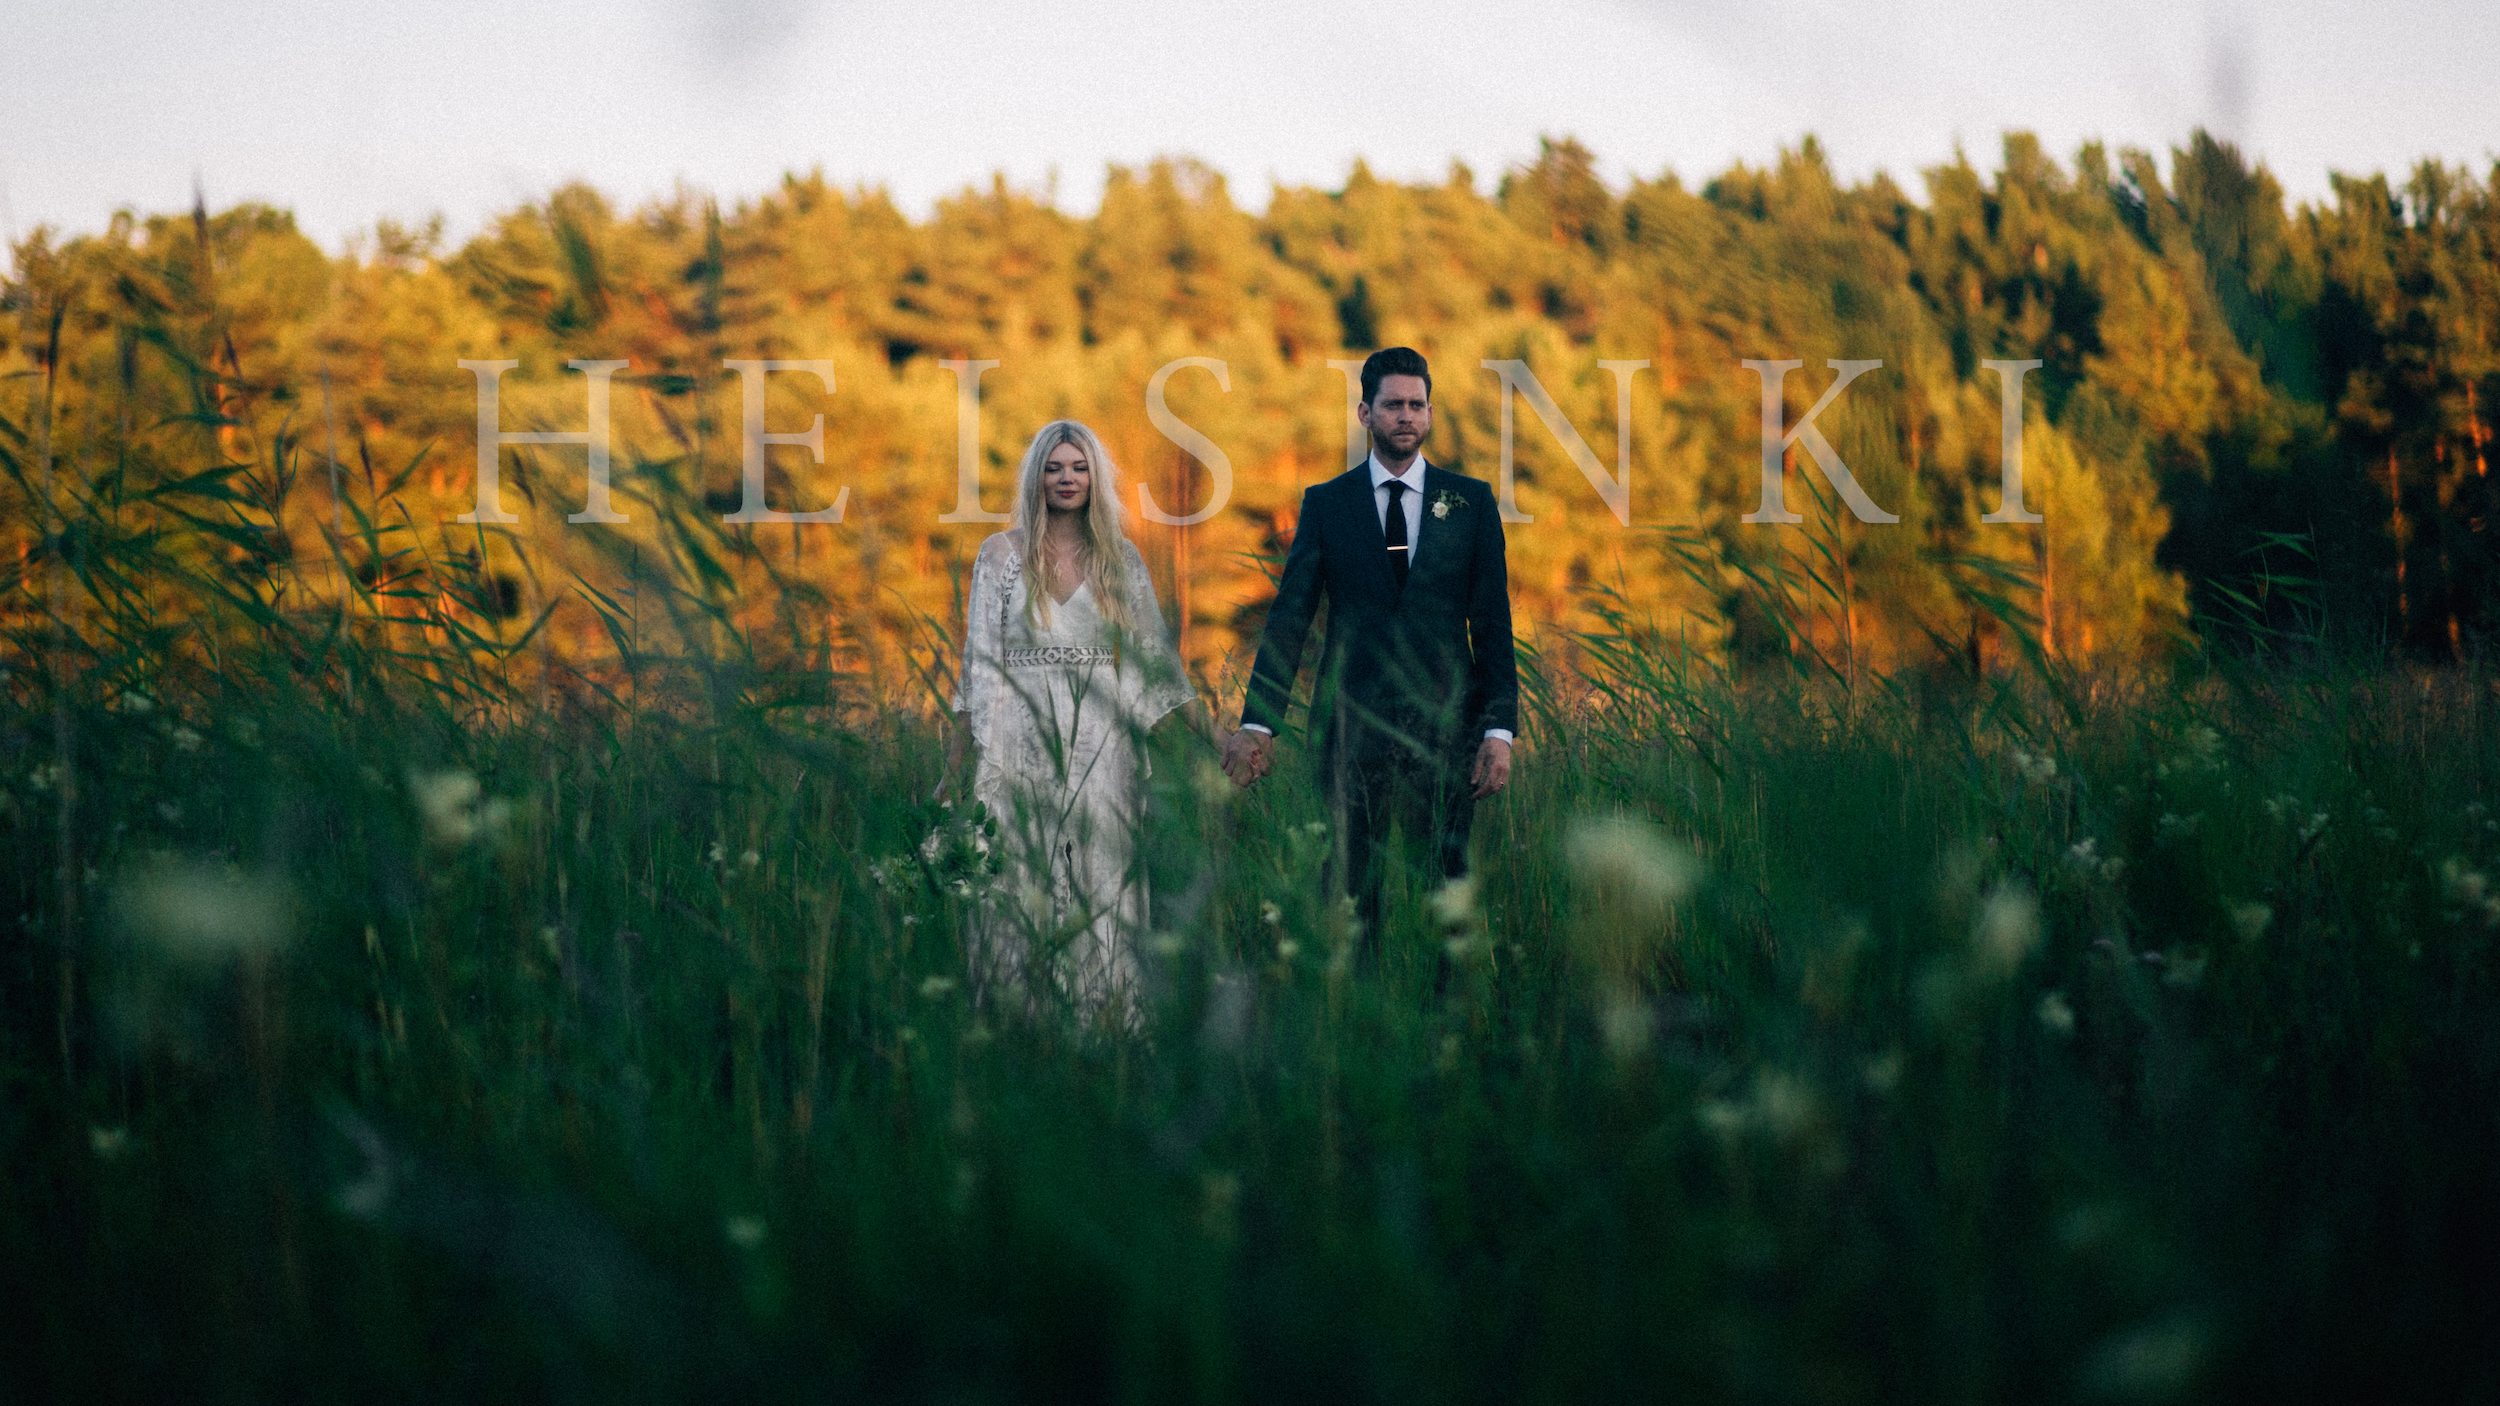 Heksinki wedding videogrpaher.jpg